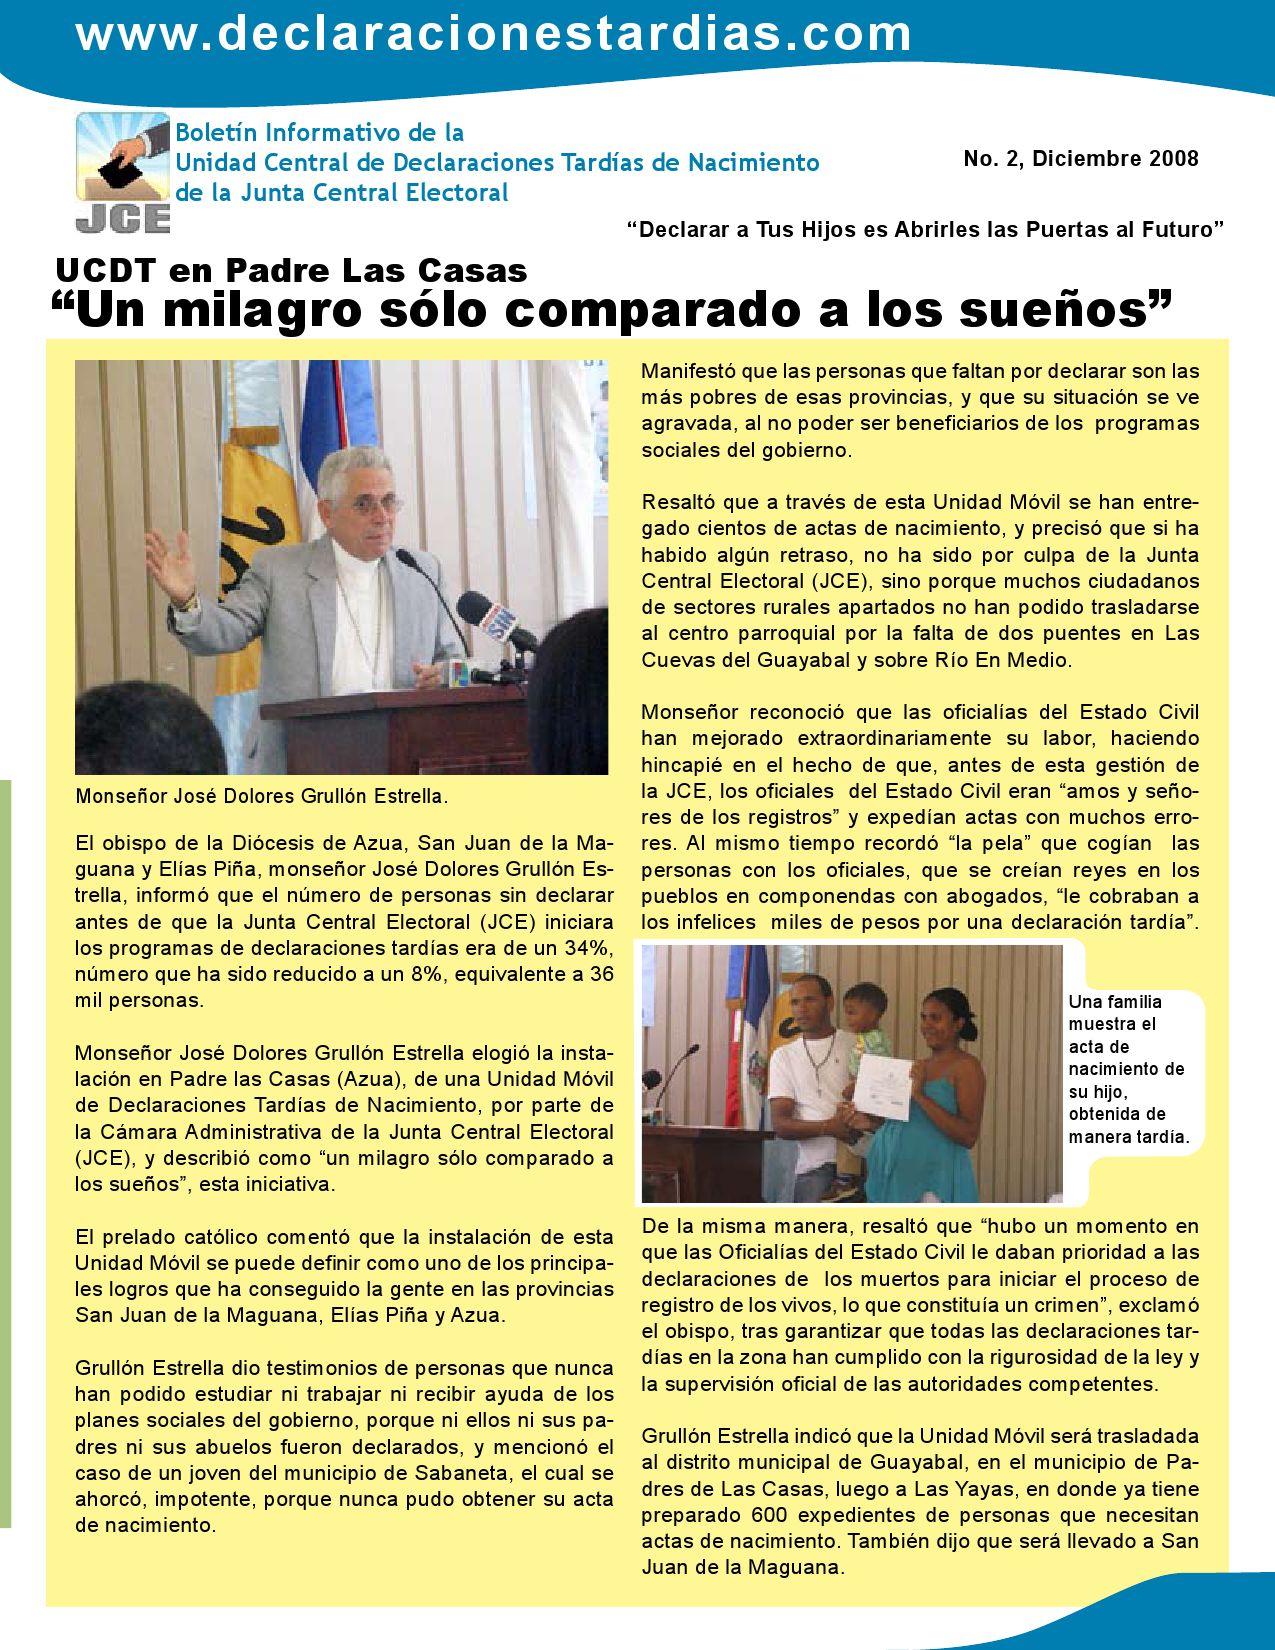 BOLETIN_2_DECLARACIONES_TARDIAS by Junta Central Electoral (JCE) - issuu